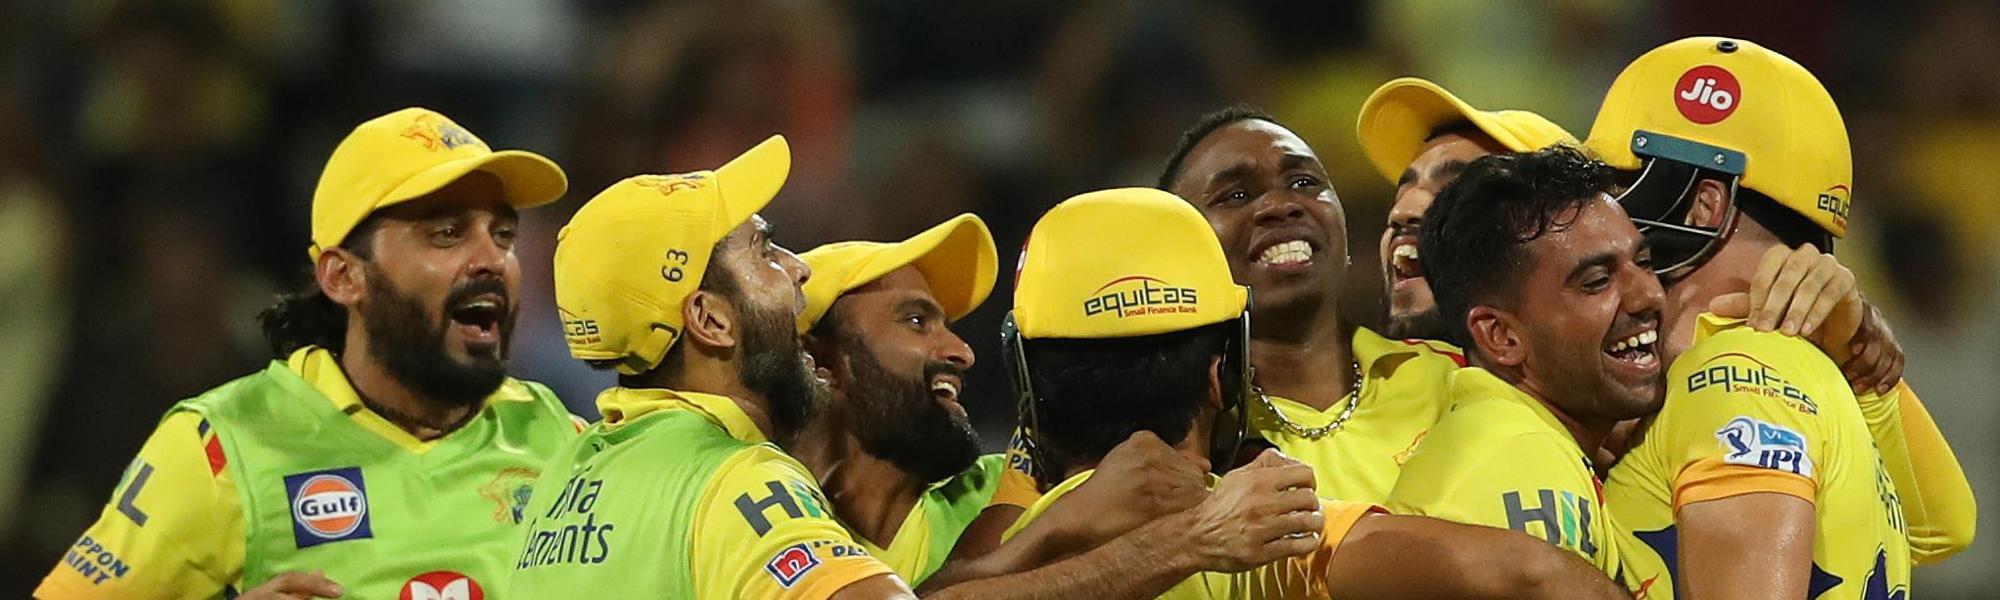 Chennai have impressed at IPL 2018 despite an ageing squad